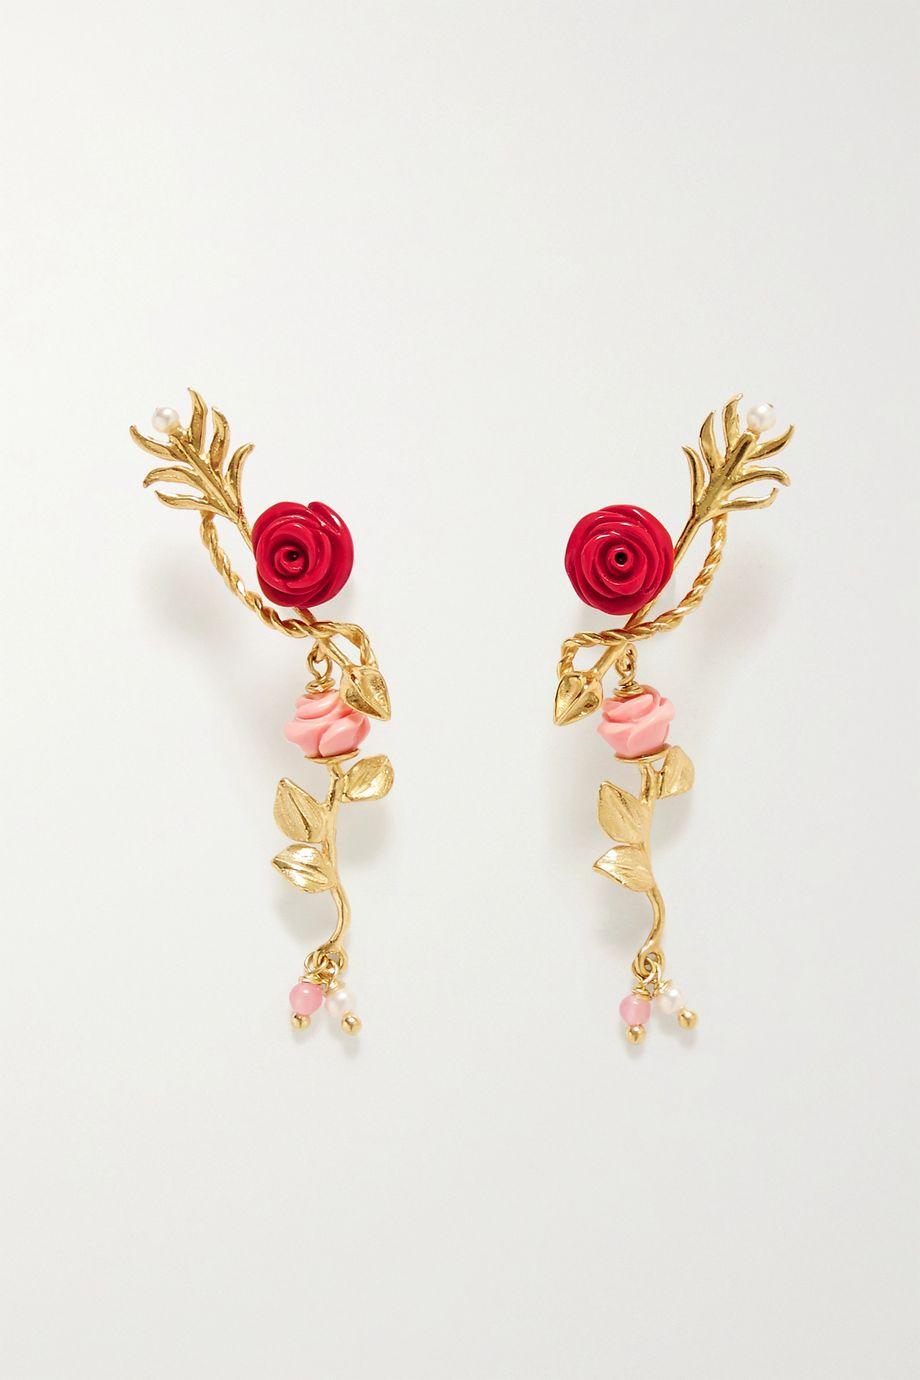 Of Rare Origin Wishing Arrow gold vermeil multi-stone earrings